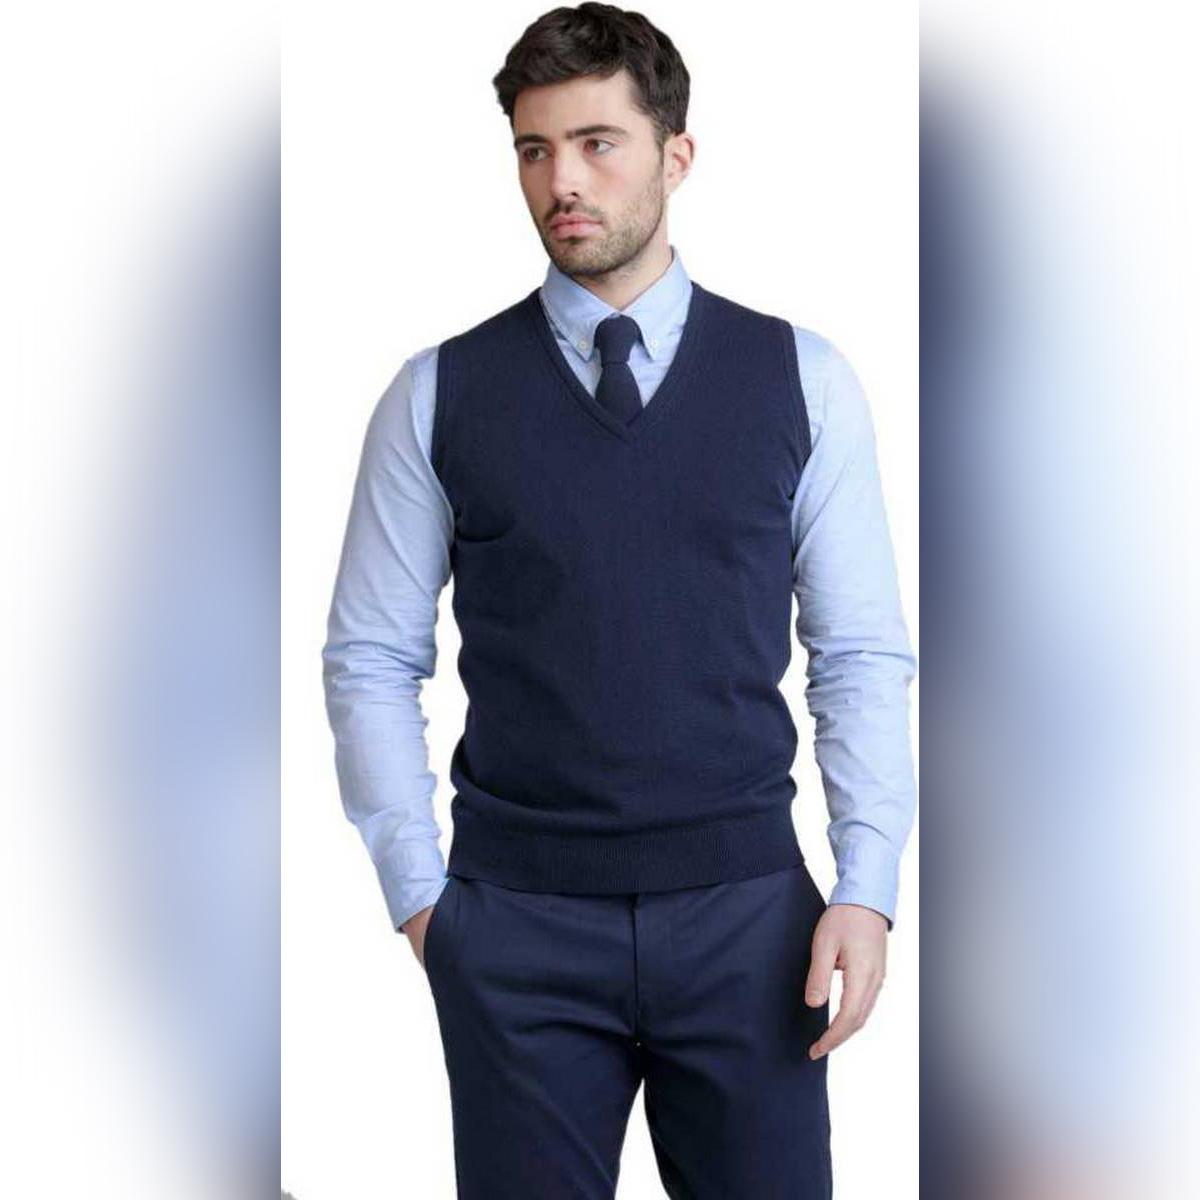 AL FAJAR Branded Export Quality Premium Rich 100% Finest Malaysian Cotton Sleeveless Navy Blue Formal V-Neck Sweater For Men, Hoodie For Men, Sweatshirt For Men